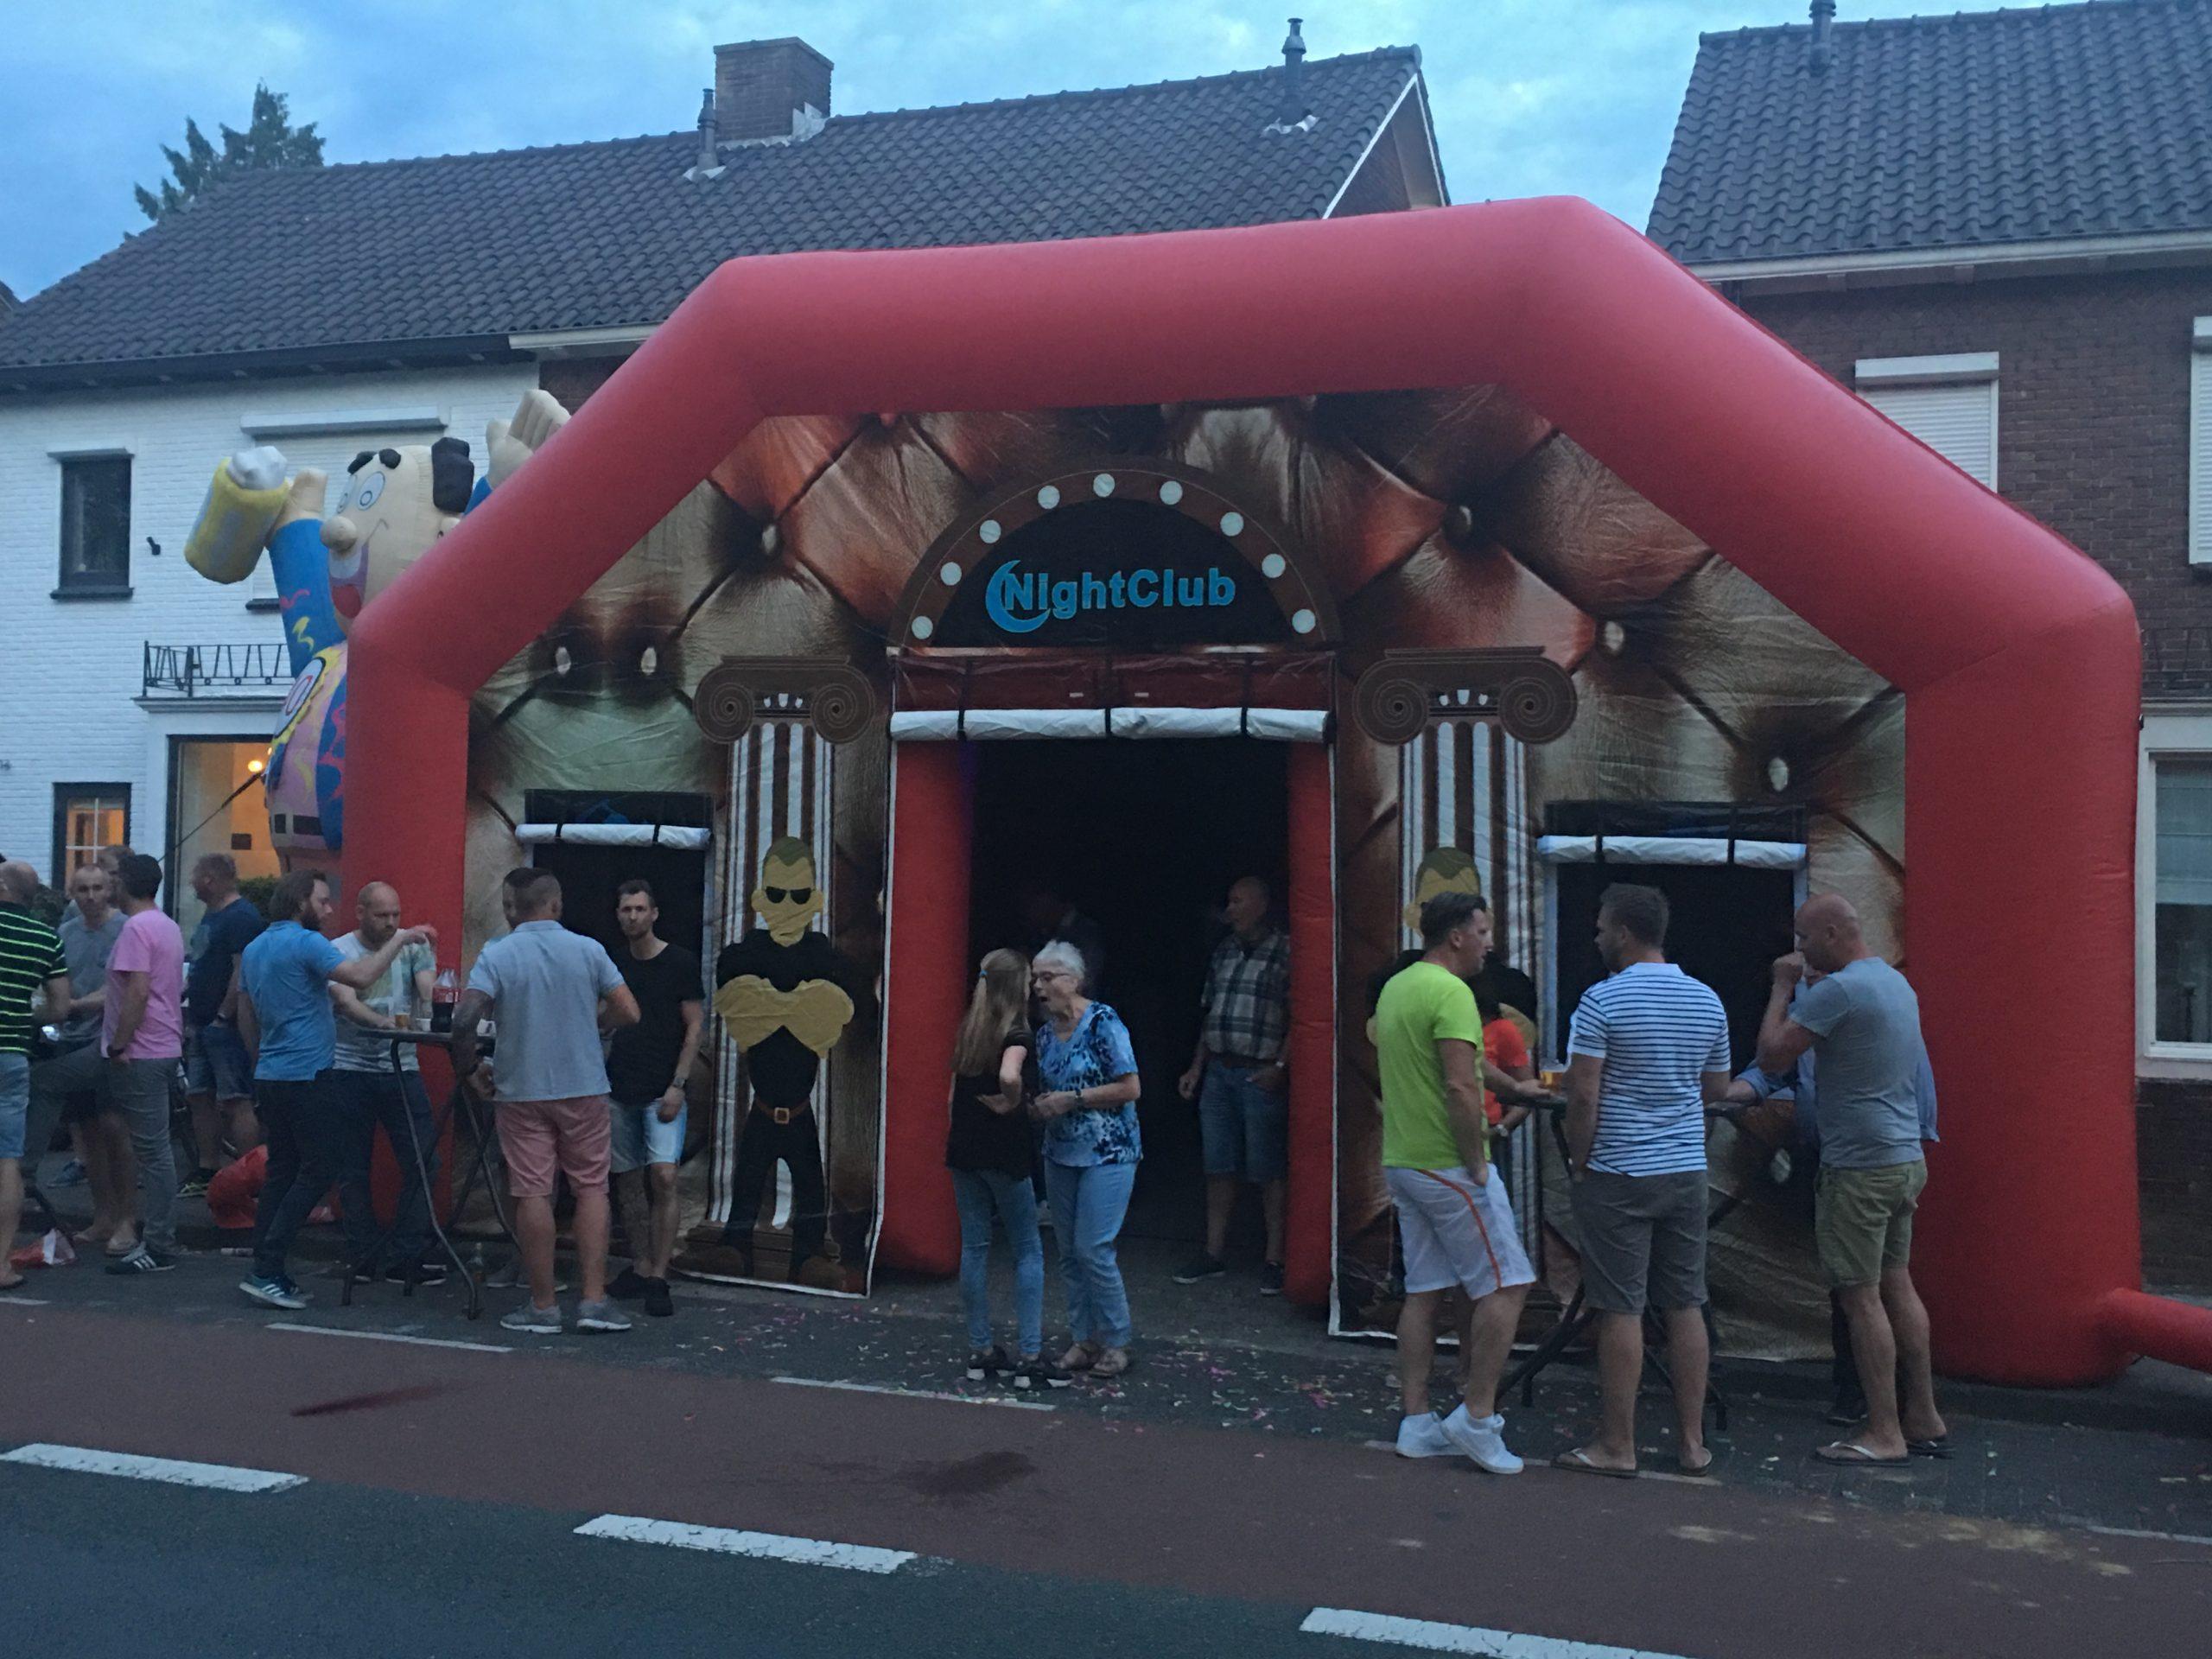 Nachtclub-te-huur-bij-X-perience-Events-Twente-3